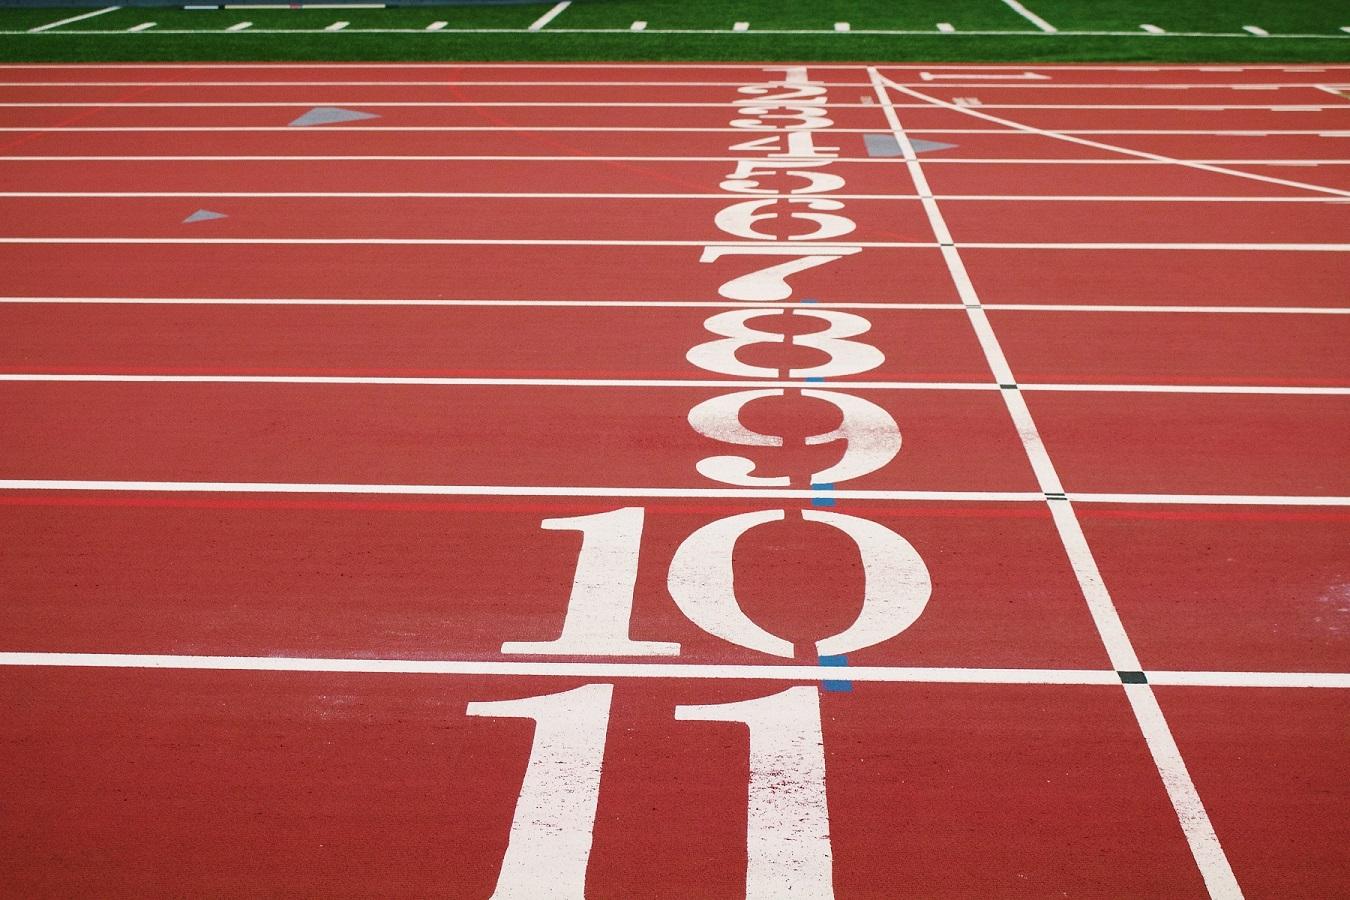 Estabelecer objetivos para 2018 - Atletismo